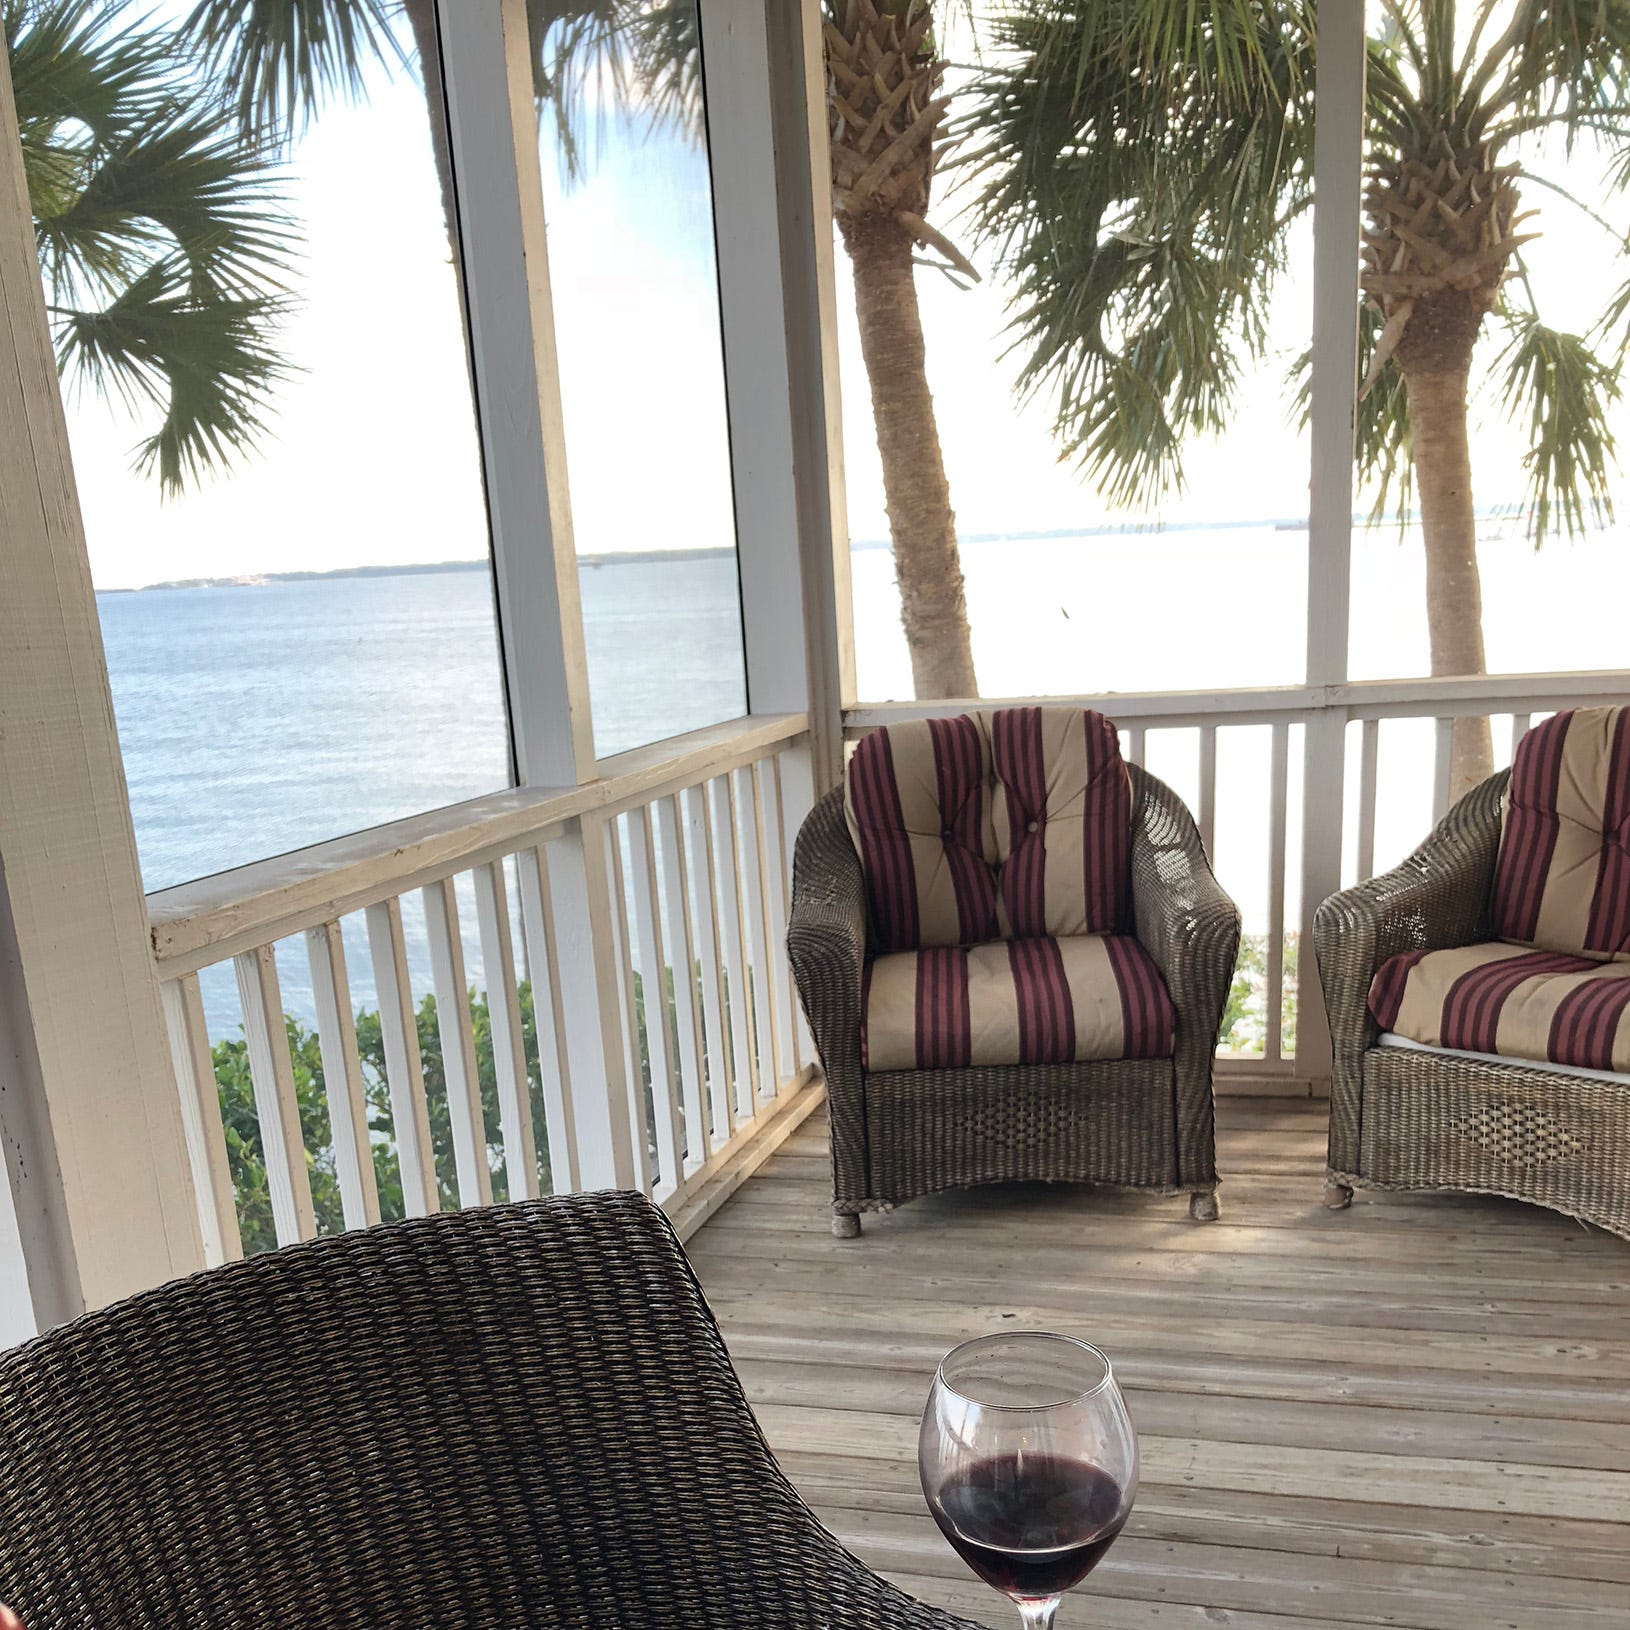 Charleston, South Carolina, travel guide: Southern charm with coastal appeal